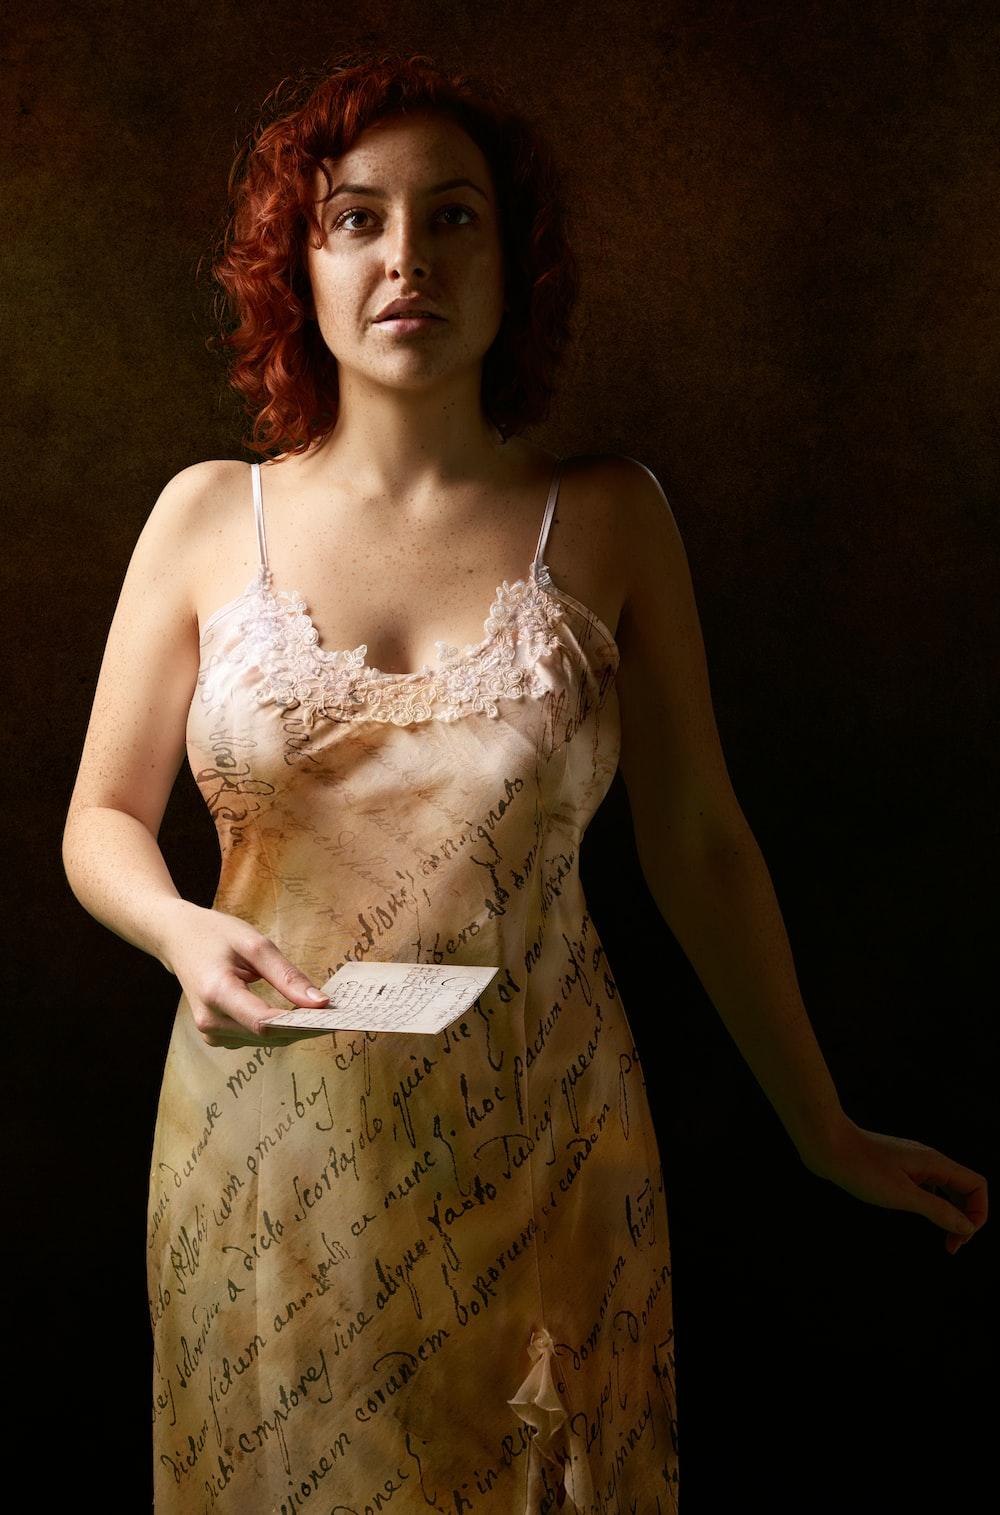 woman in white spaghetti strap dress holding white paper